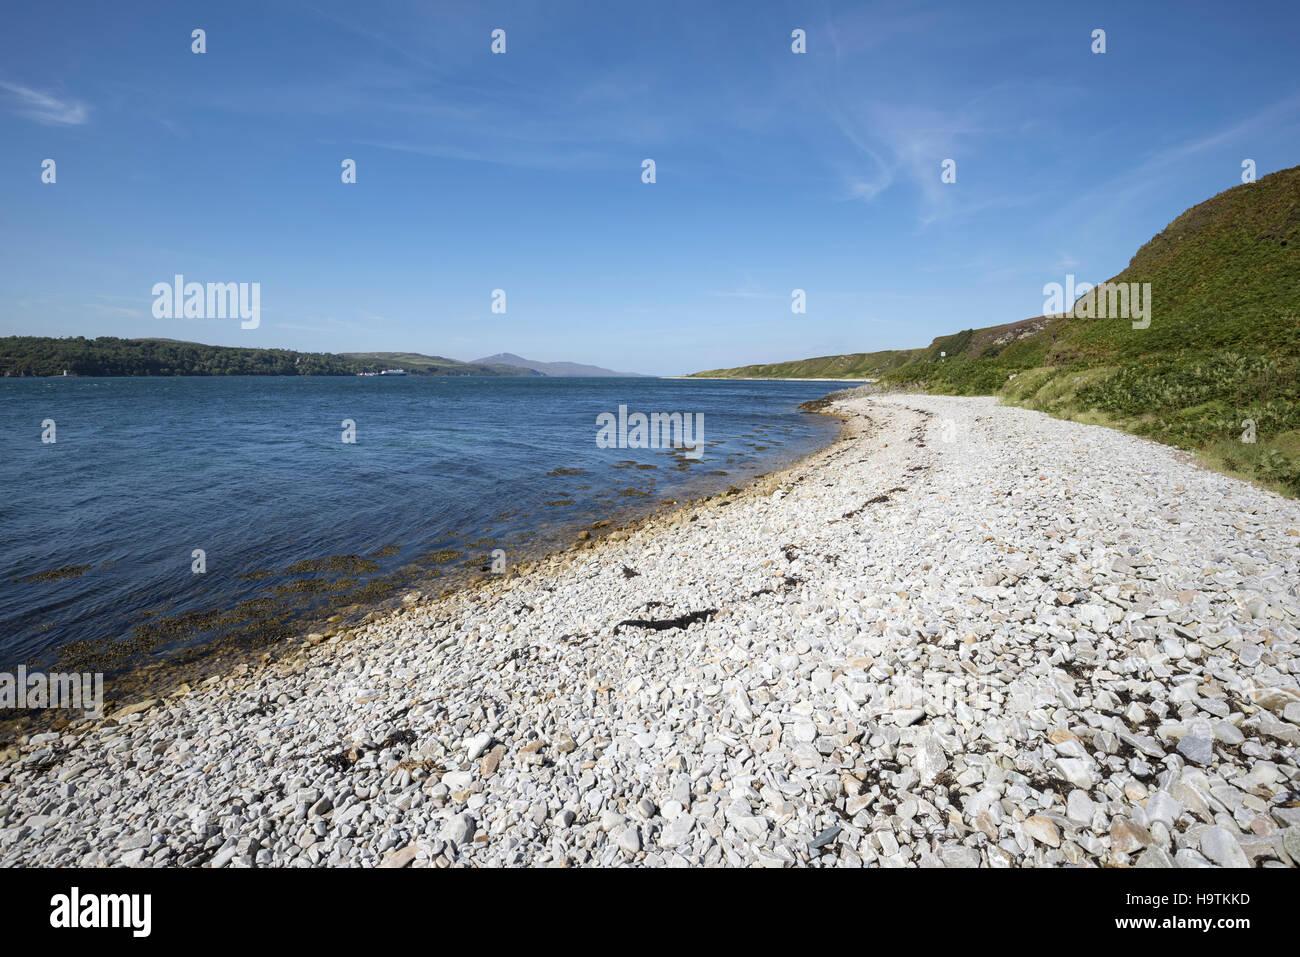 Shingle beach at Sound of Islay, Isle of Jura, Inner Hebrides, Scotland, United Kingdom - Stock Image